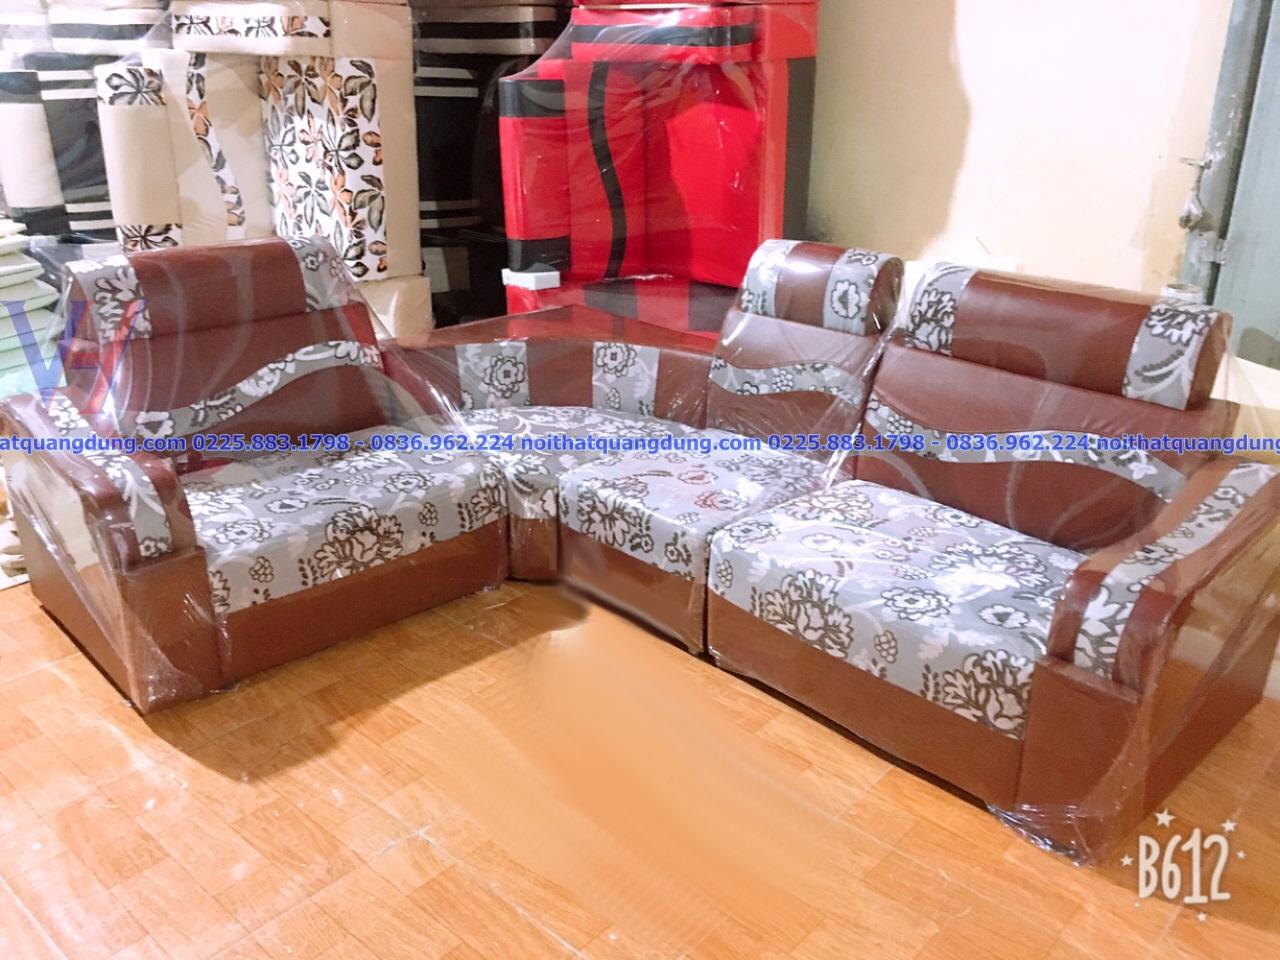 Sofa da mặt nỉ-DGN-210